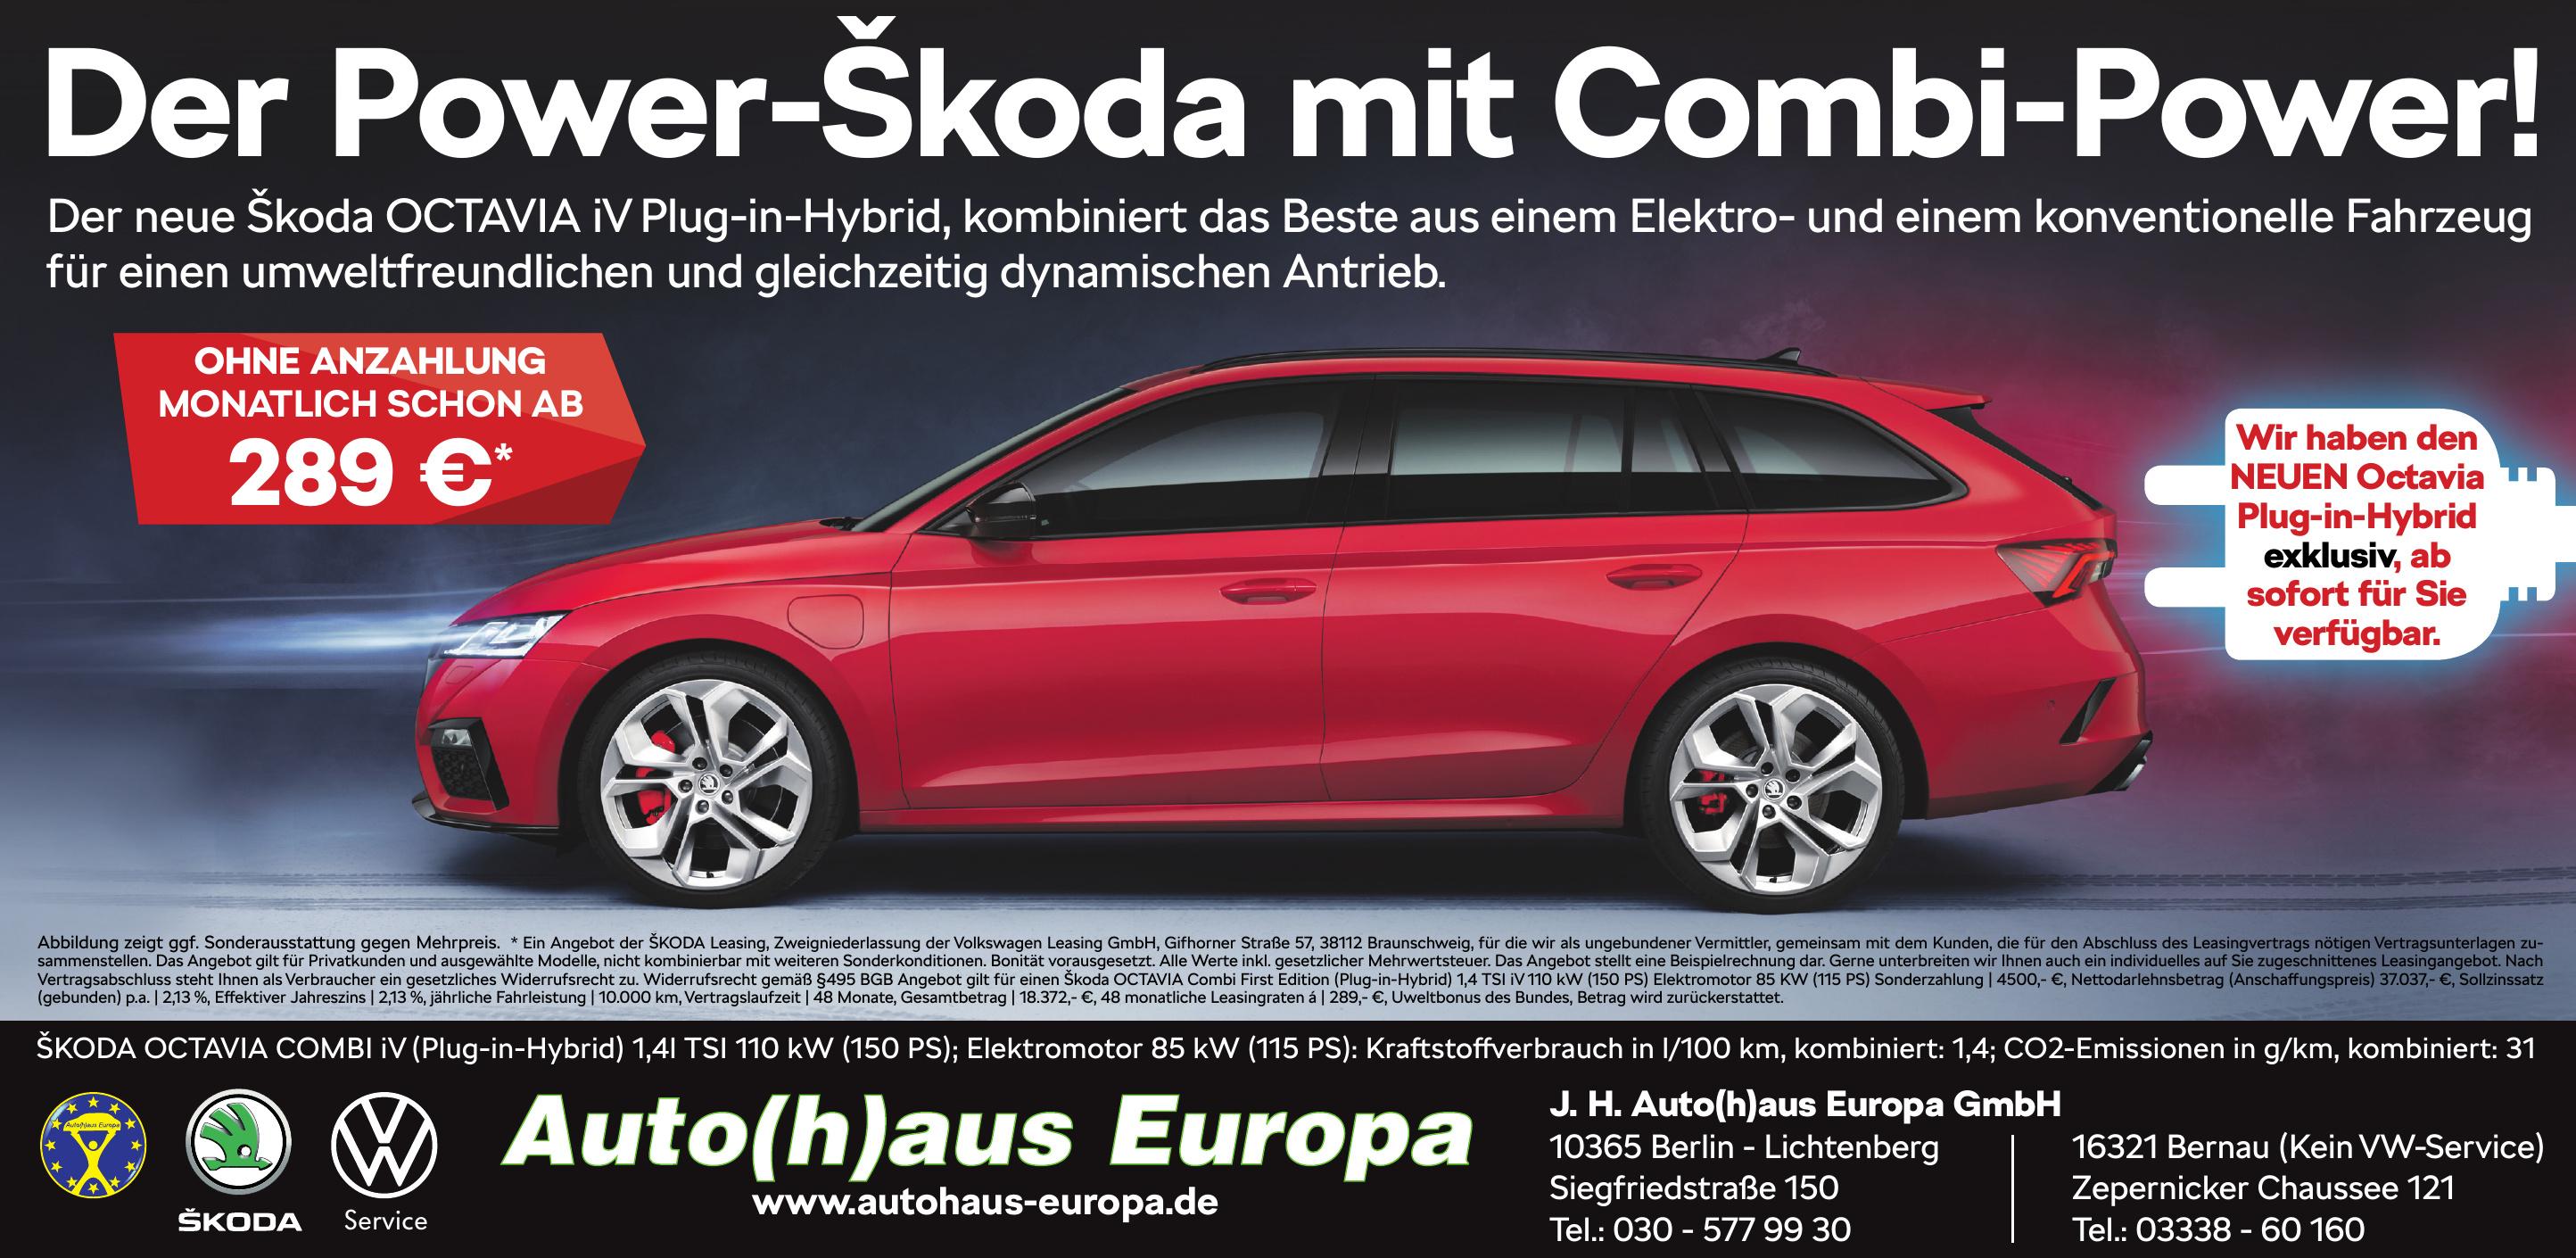 J. H. Auto(h)aus Europa GmbH